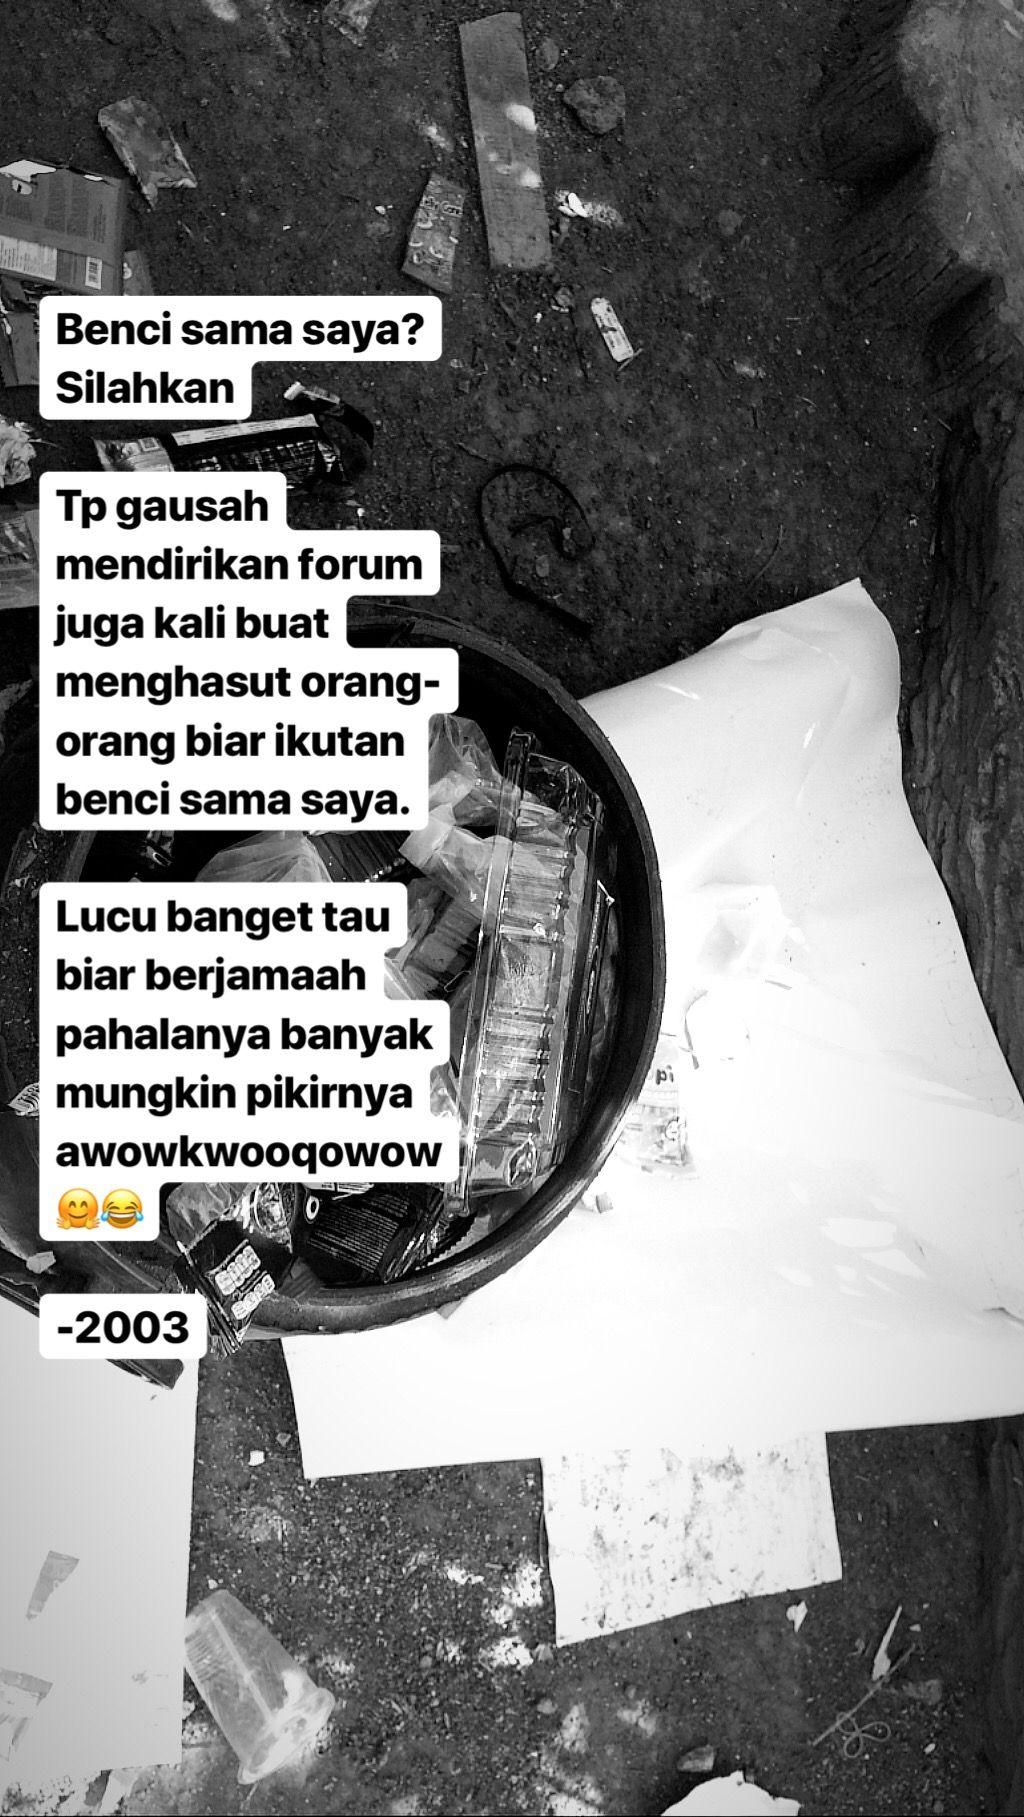 Buangsaaat Kata Kata Nyindir Uploaded by user